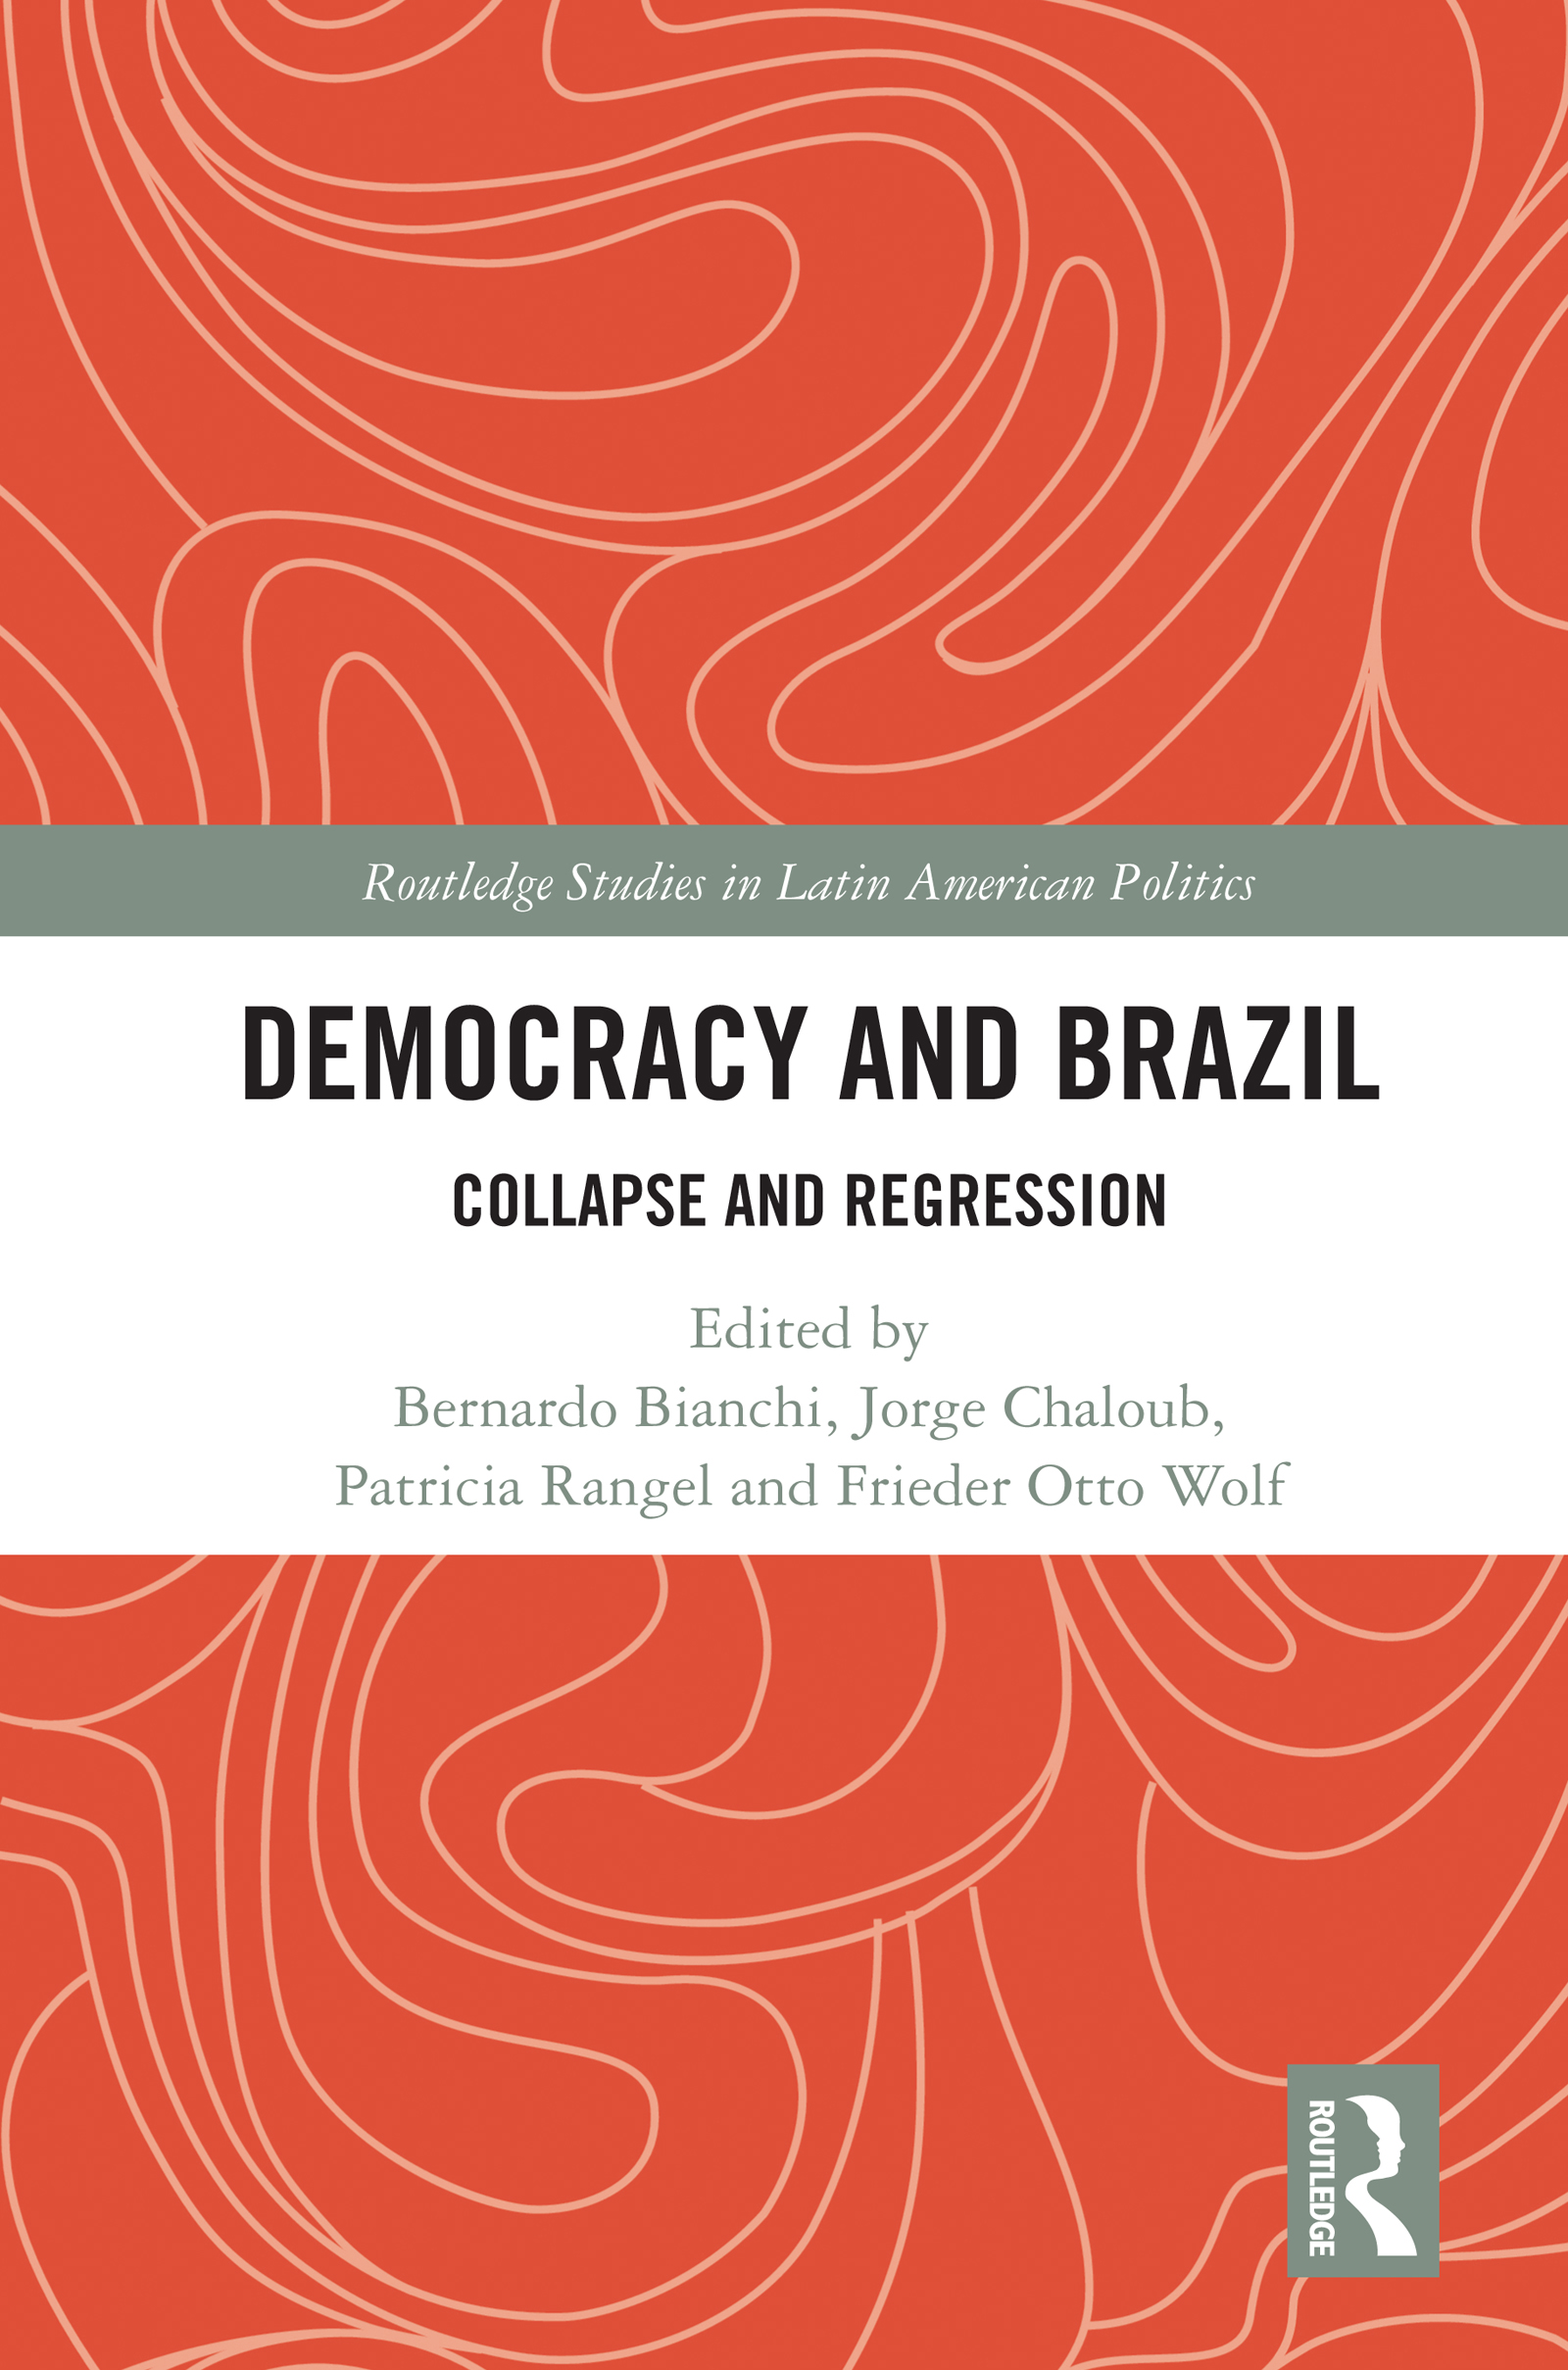 Democracy and Brazil